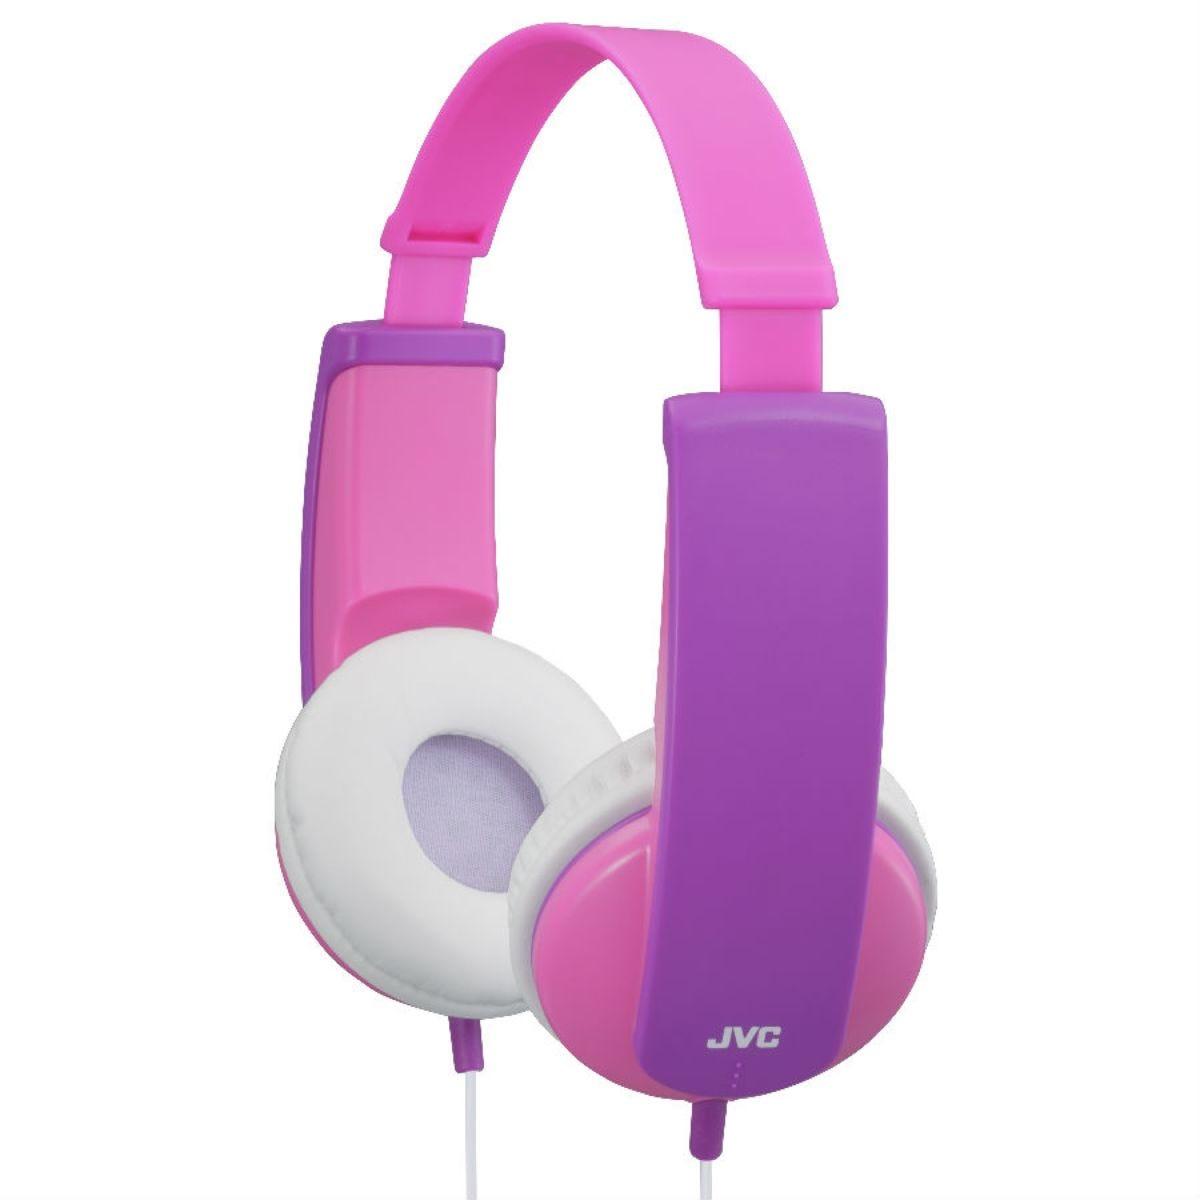 JVC HA-KD5 Kids On-Ear Headphones - Pink/Purple